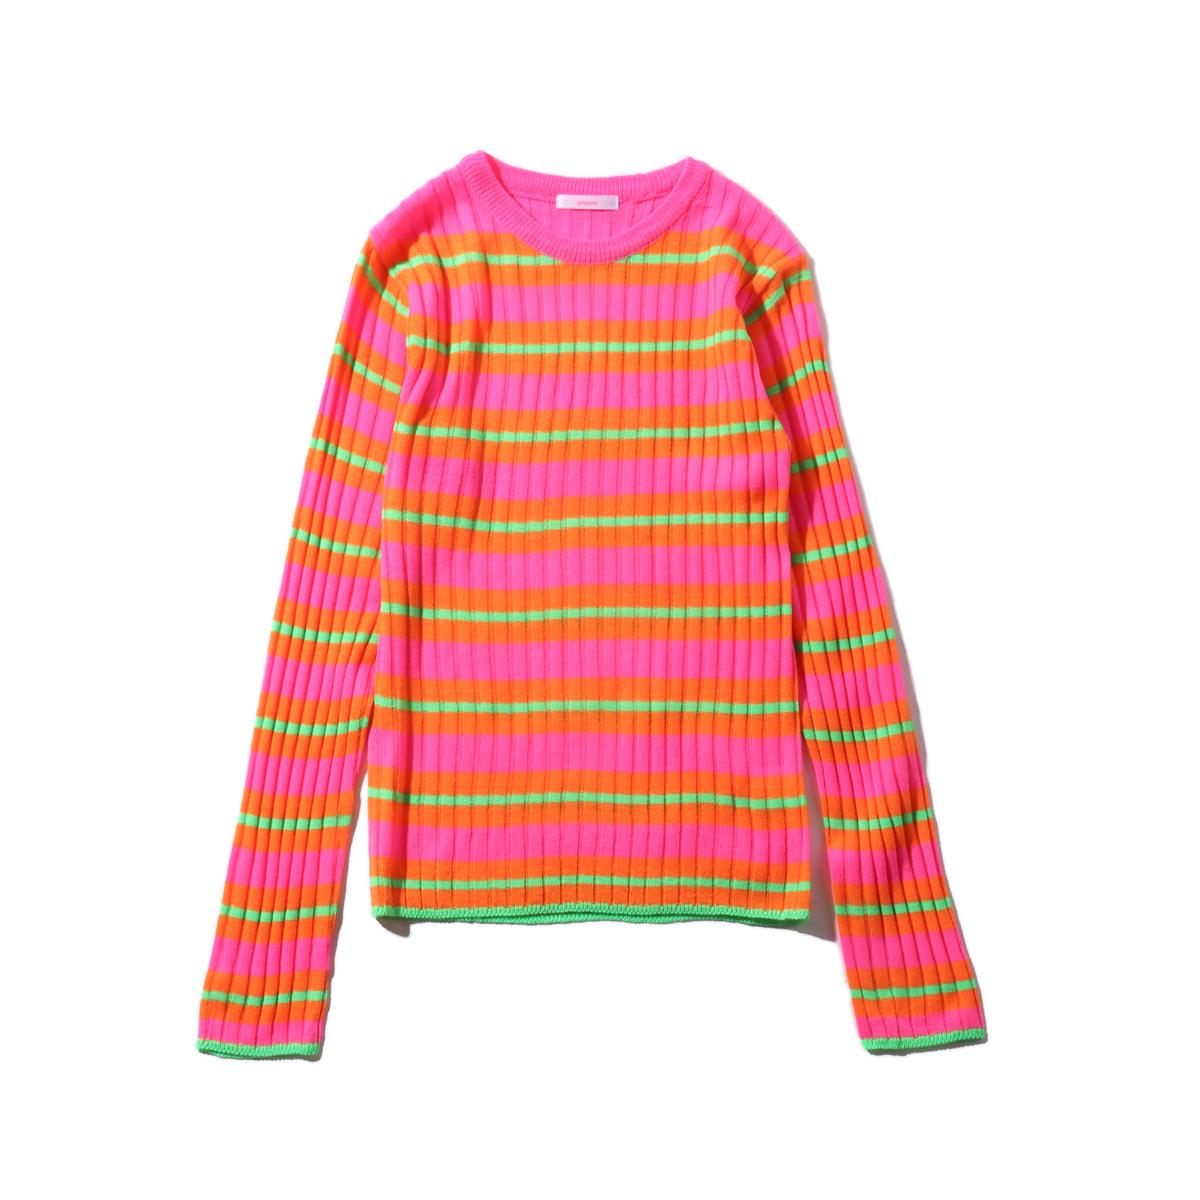 atmos pink ボーダートップス TX(アトモスピンク ボーダートップス TX)PINK【レディース 長袖Tシャツ】19FA-I